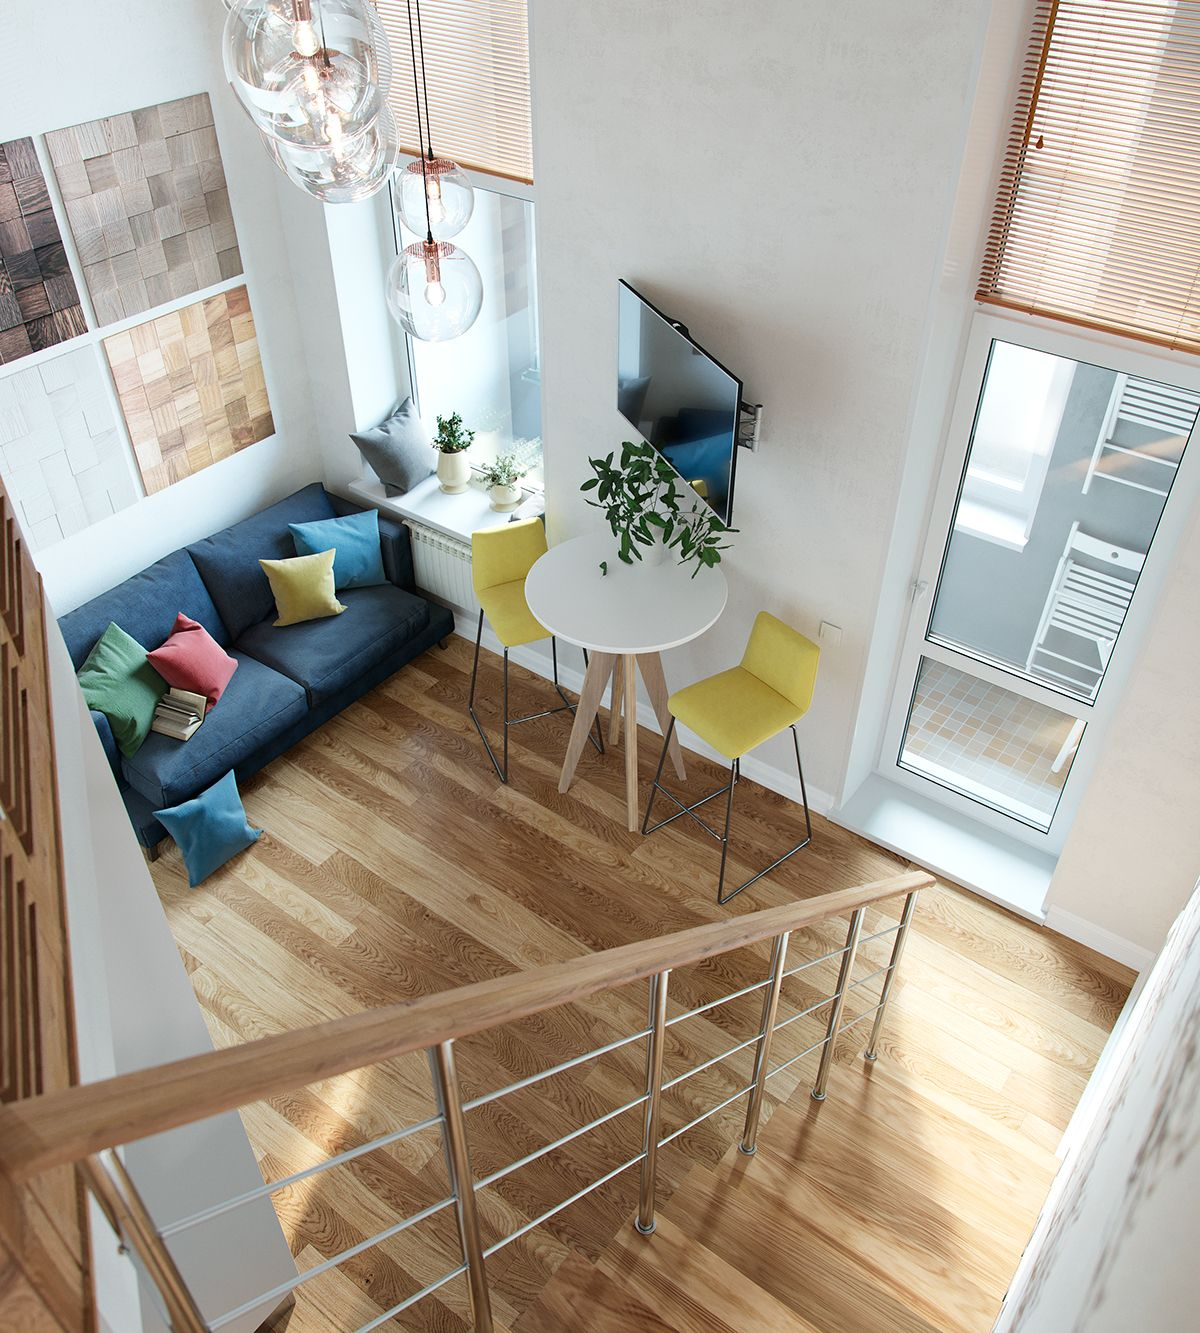 Jurnal de design interior proiect amenajare pentru  garsonier cu tavan la  also living rh pinterest